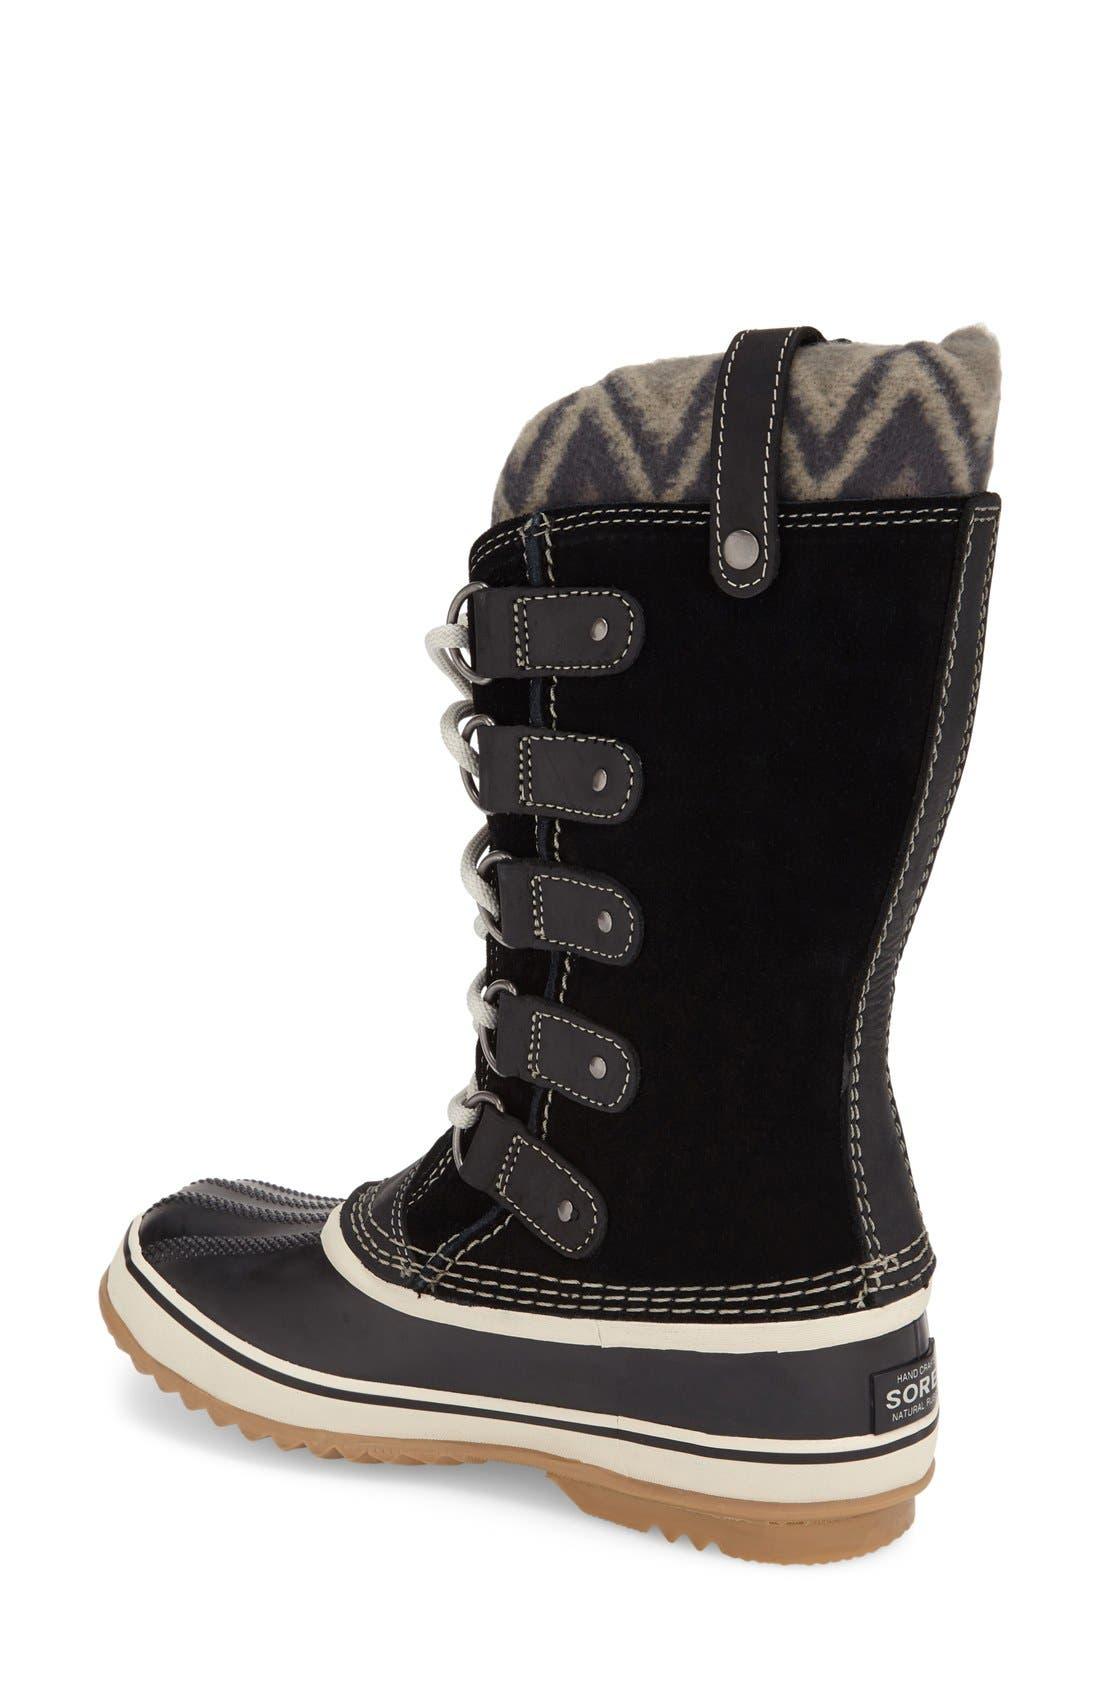 'Joan of Arctic - Knit II' Waterproof Boot,                             Alternate thumbnail 2, color,                             Black